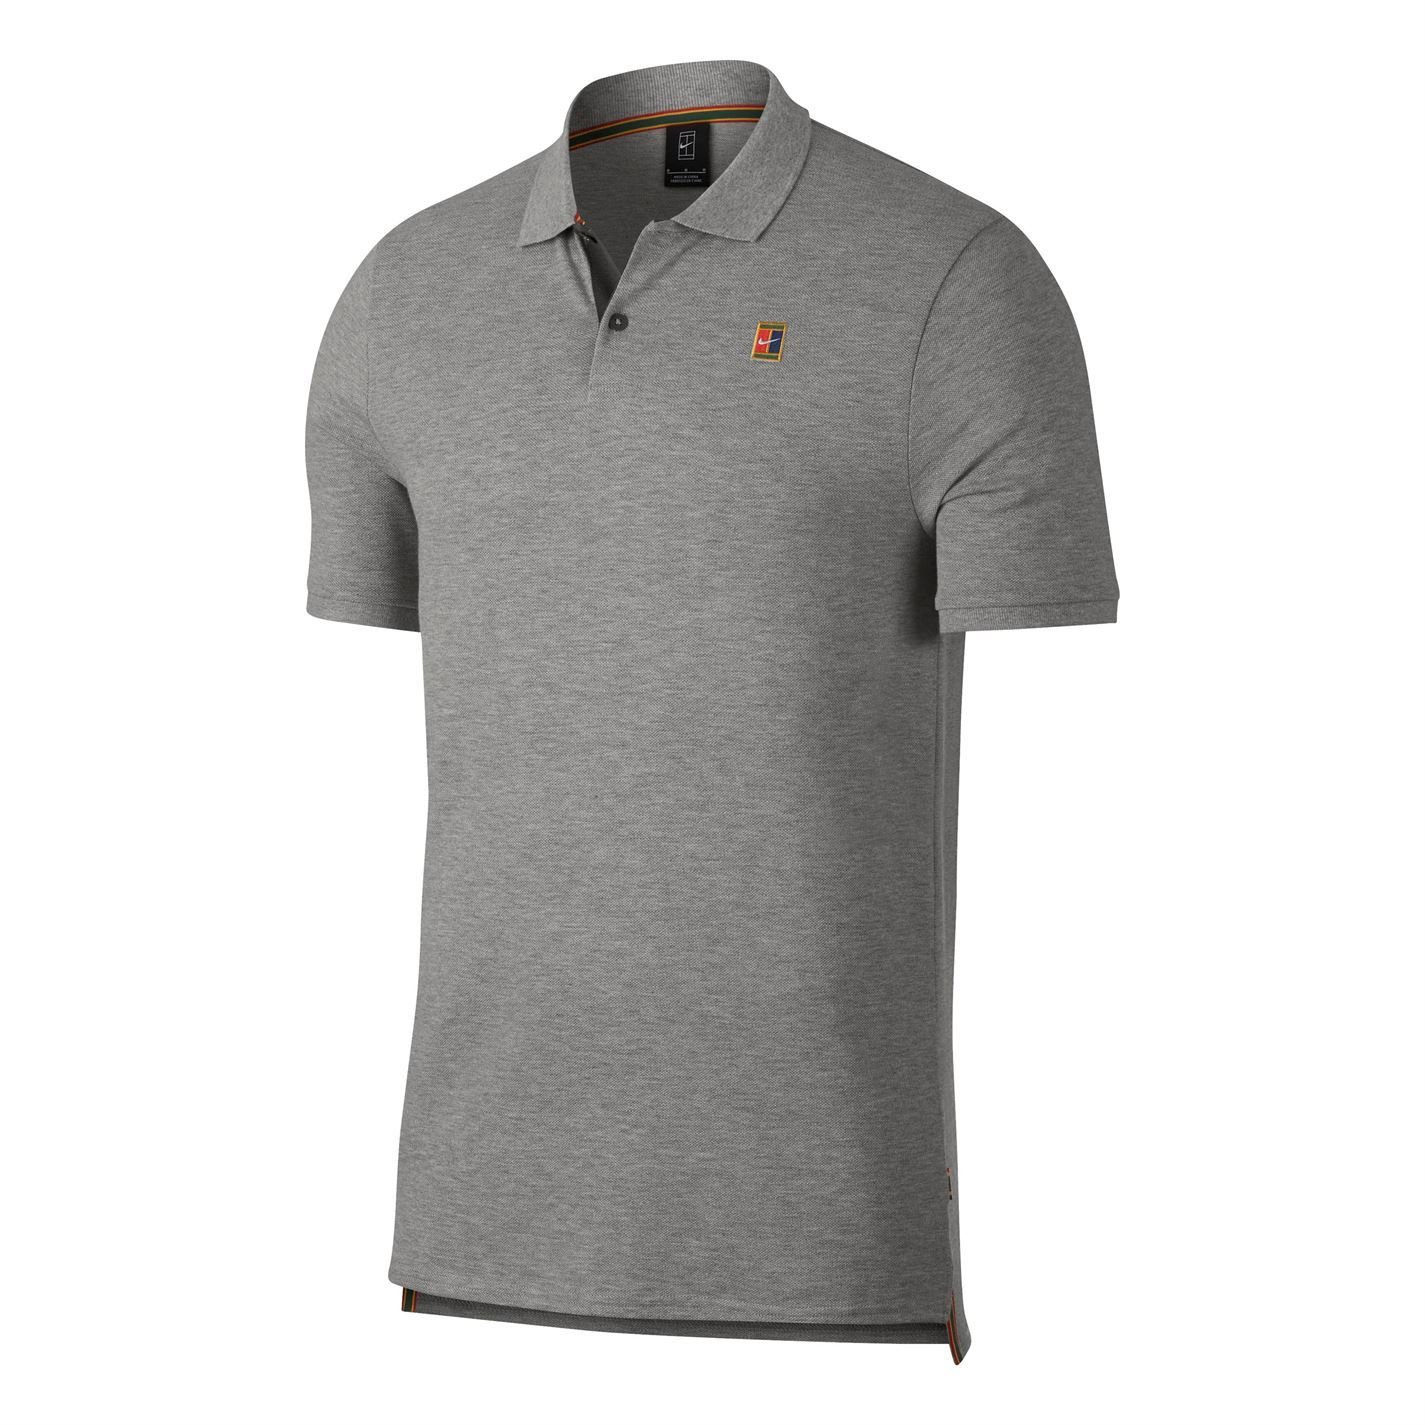 Detalles de Nike Tribunal Heritage Tenis Polo Hombre Gris Activewear Camiseta Pequeño